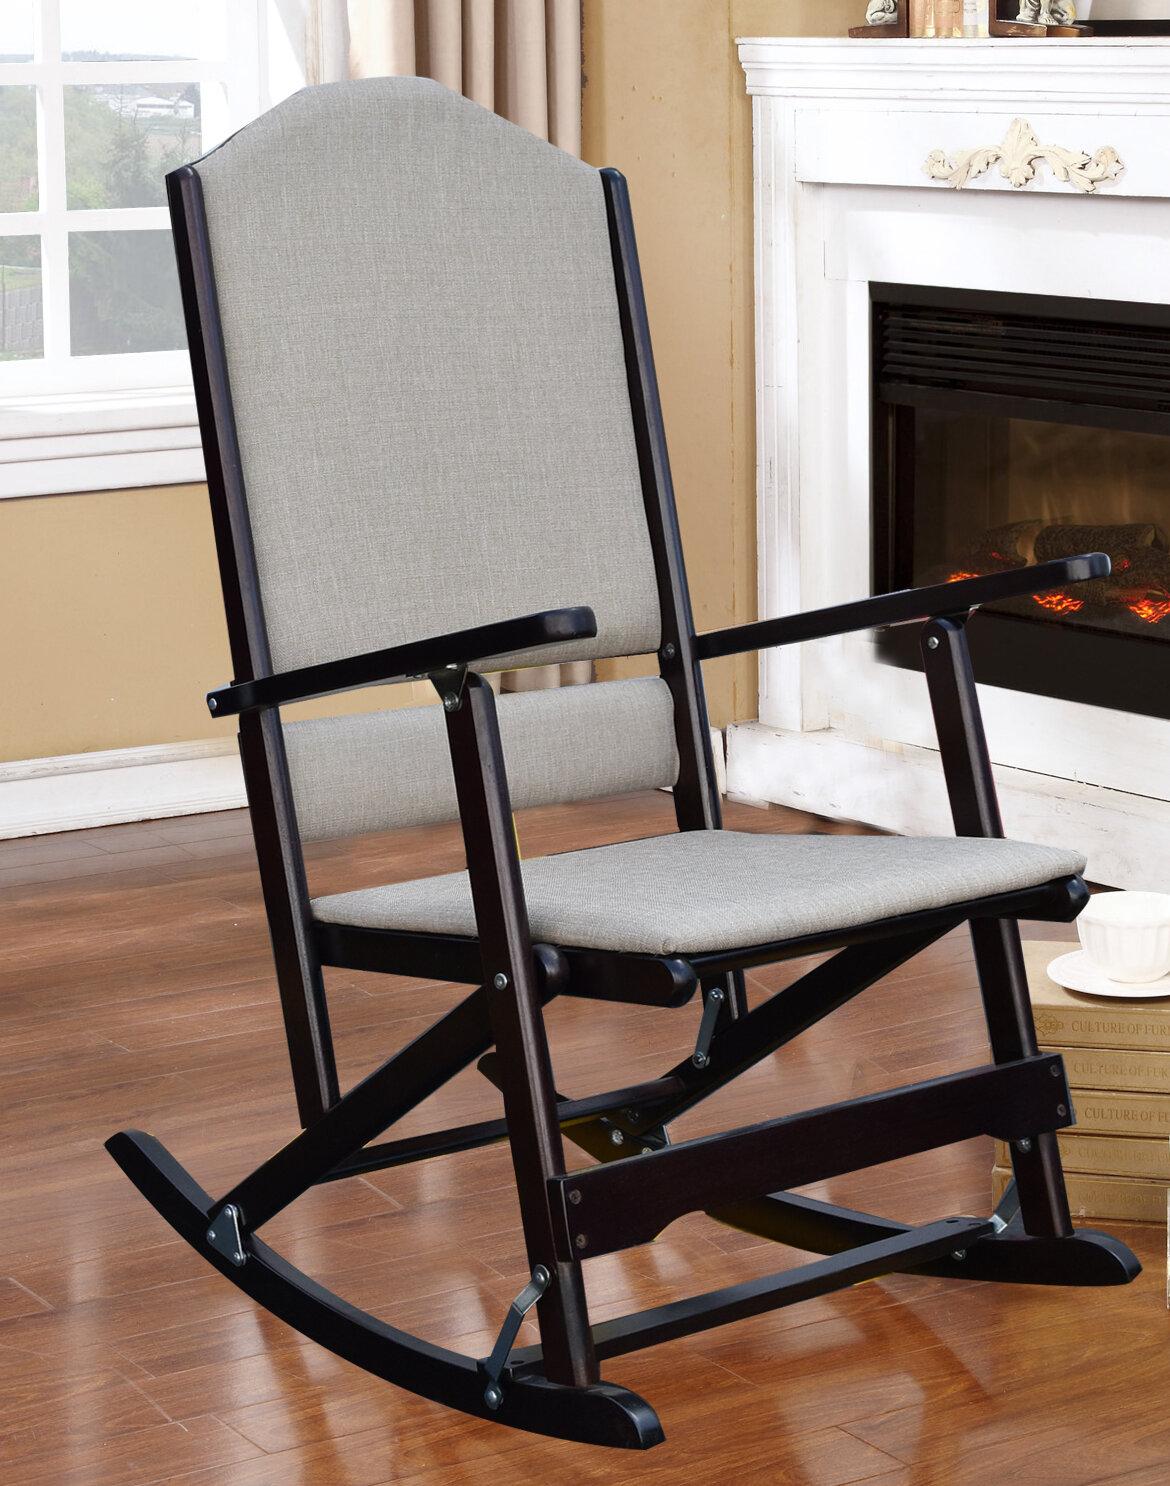 Famous Red Barrel Studio Cinthia Solid Wood Folding Rocking Chair  XU34